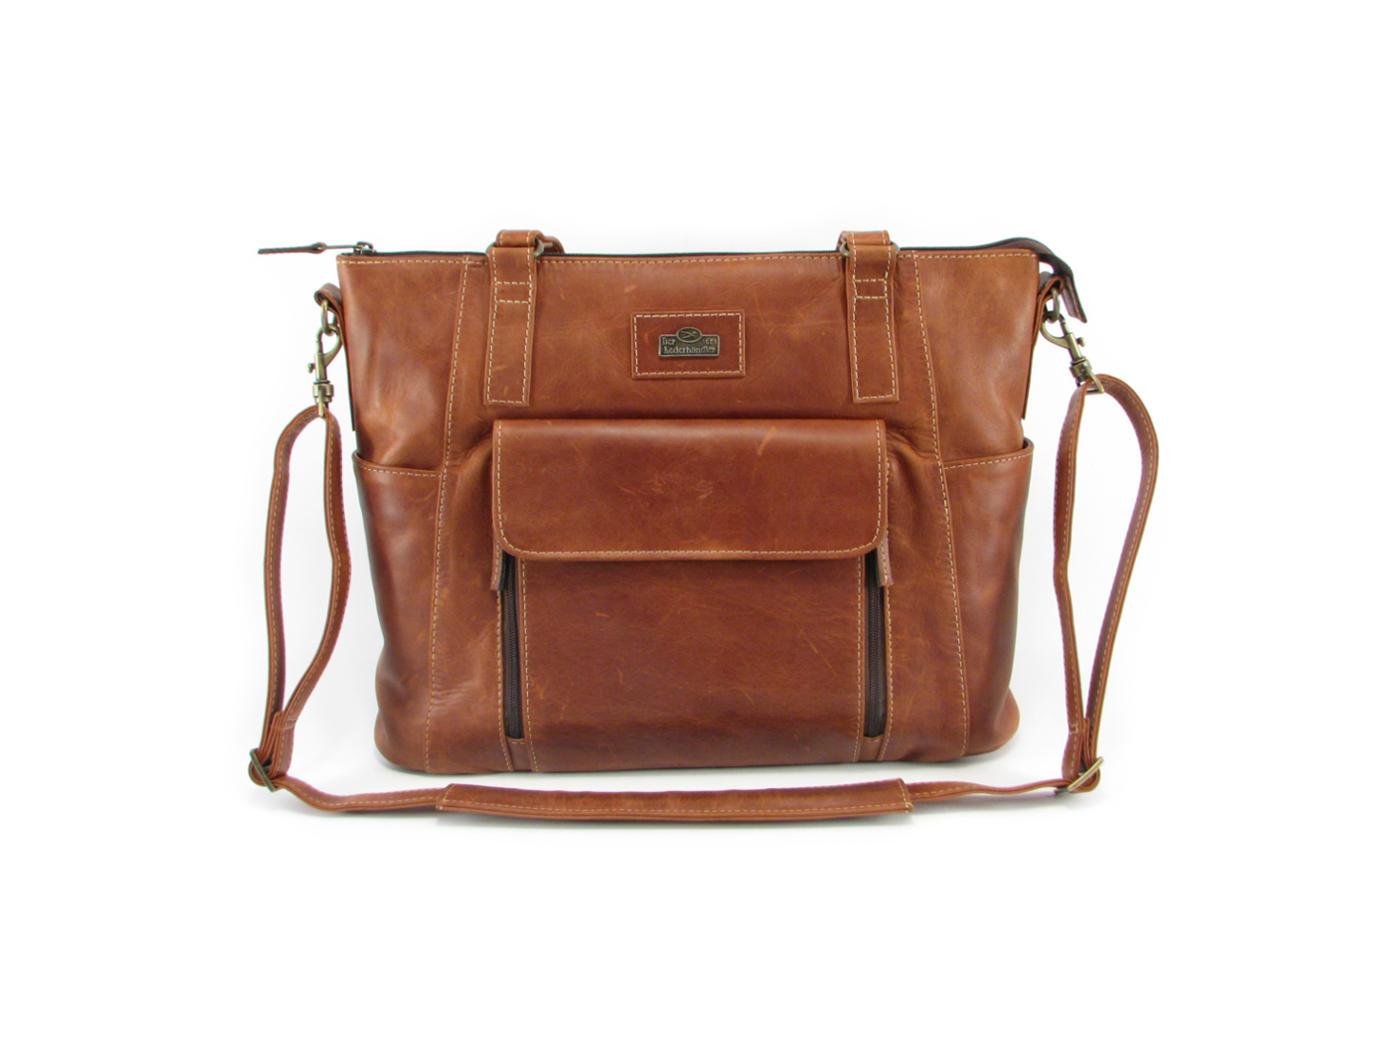 2a270239631e Tosca No 3 HP7303 front classic handbag leather bags women